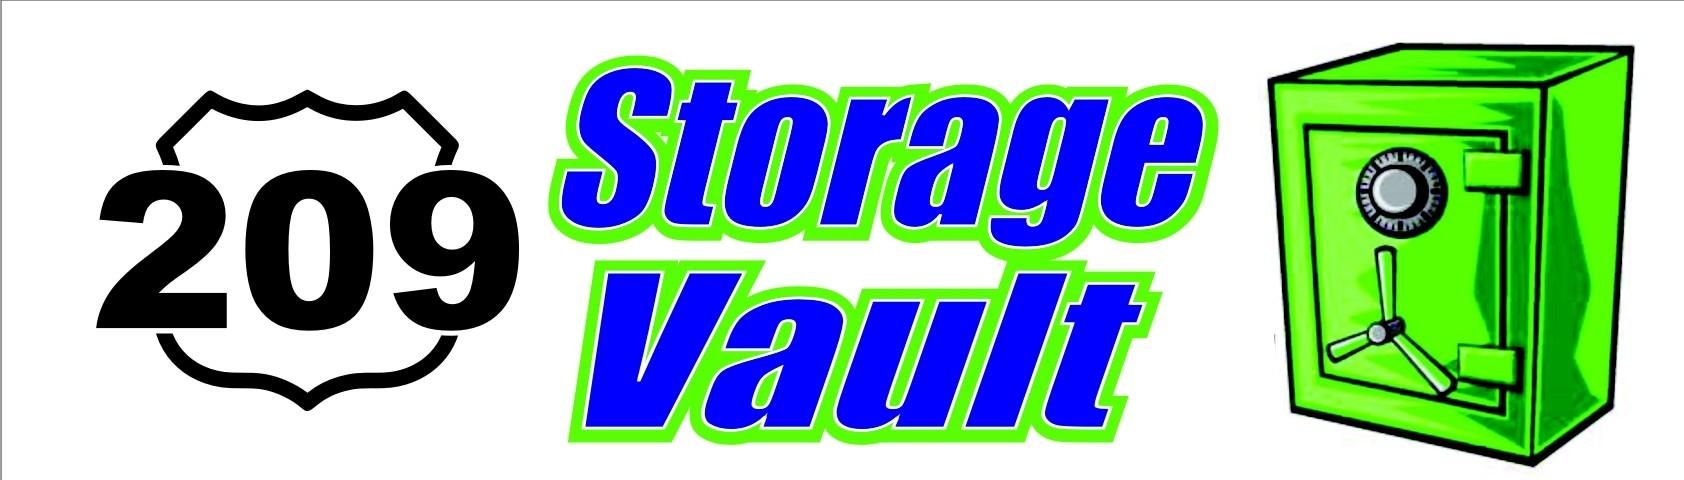 209 Storage Vault